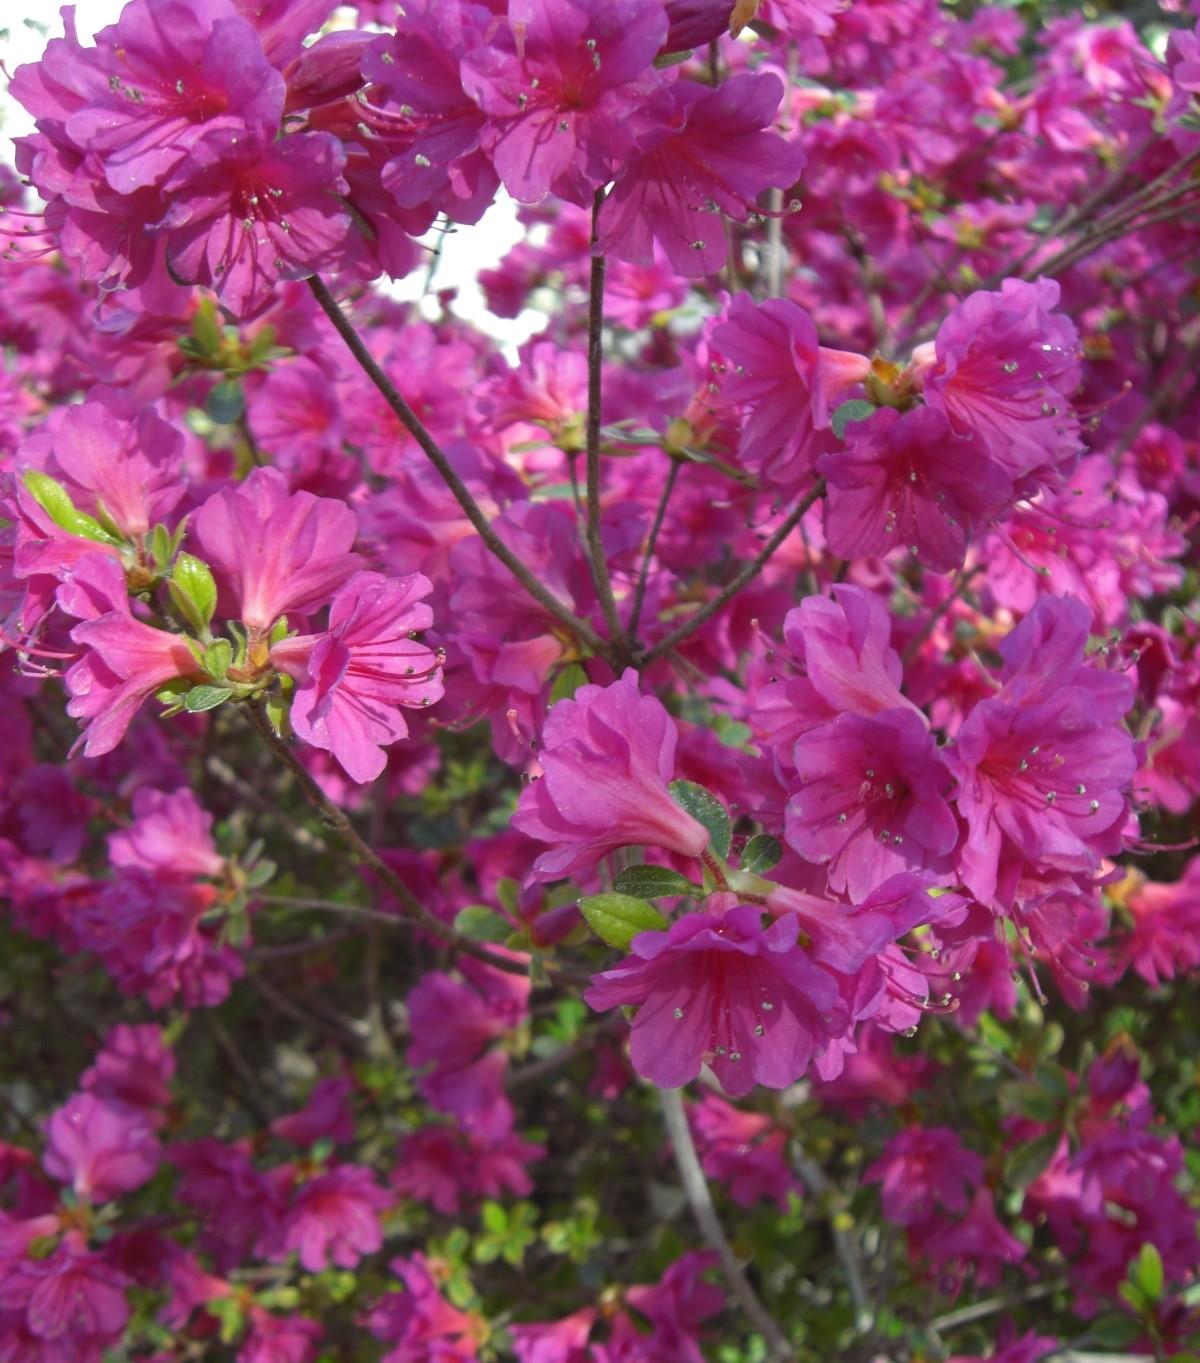 Arbusti ornamentali vivaio pesaresi for Alberelli ornamentali